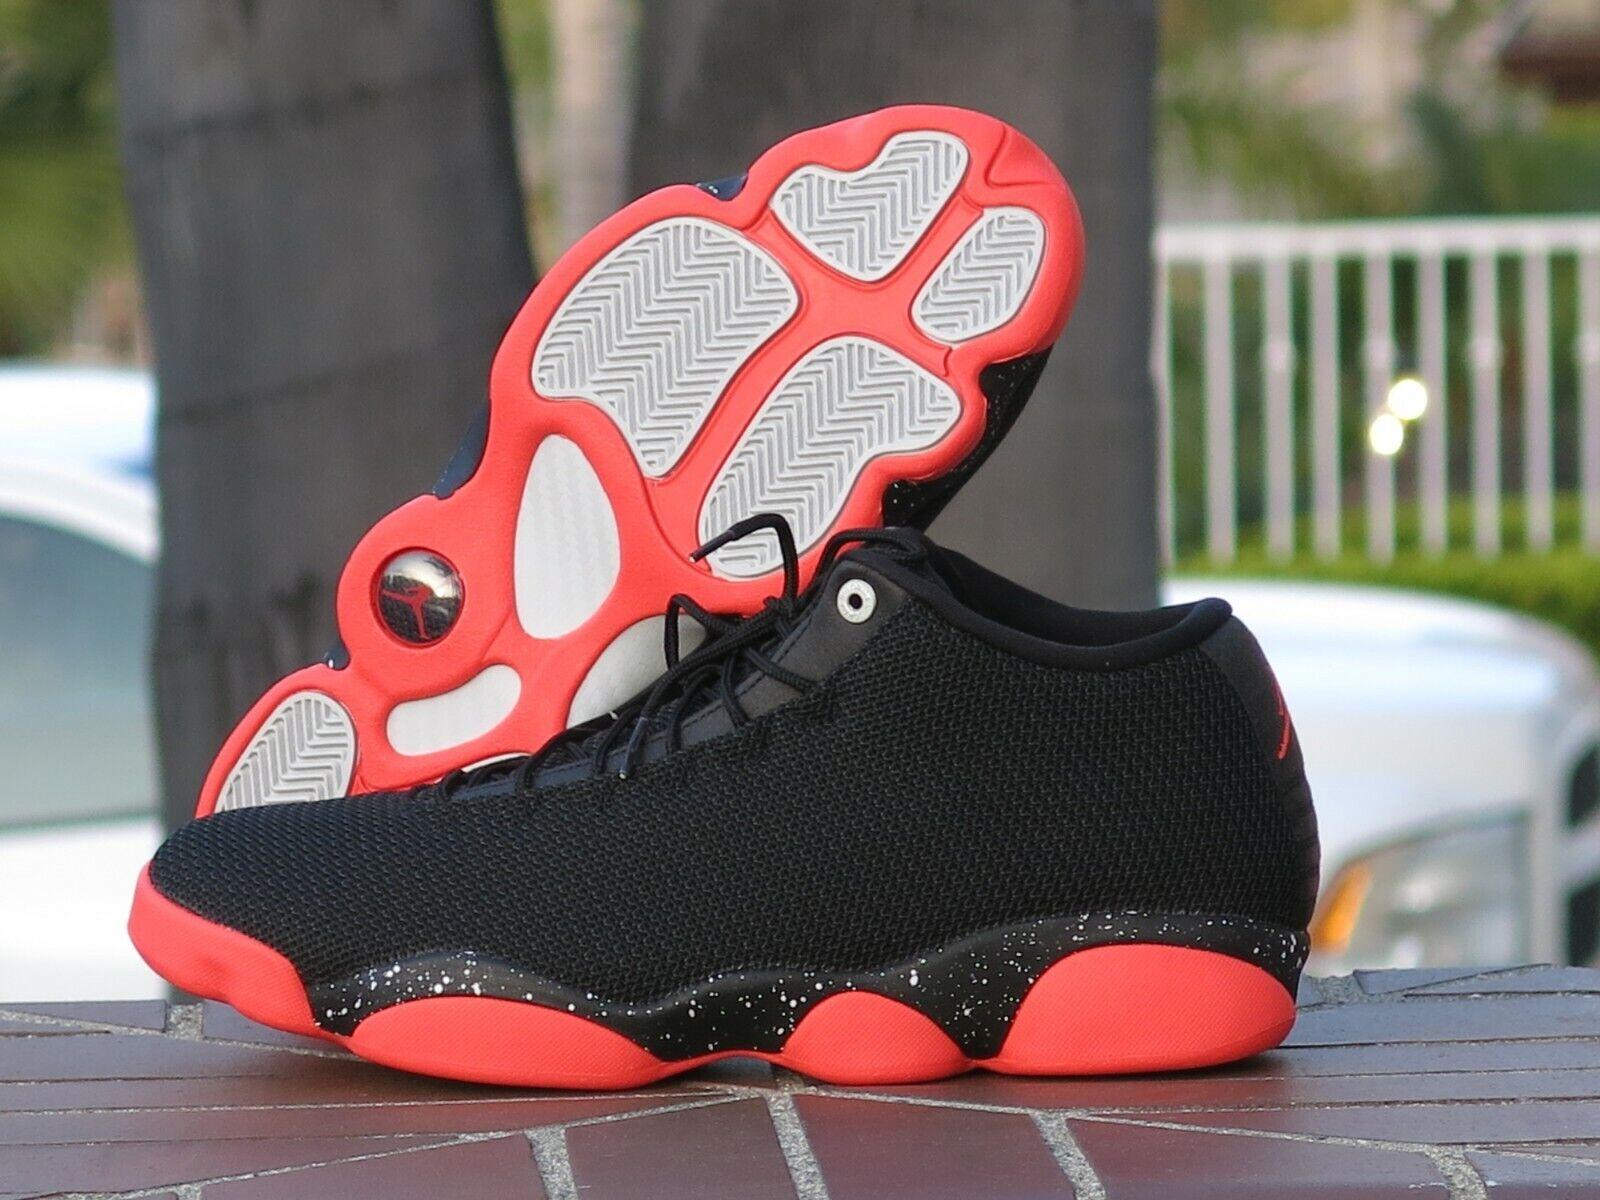 0264391477591e Nike Jordan Horizon Horizon Horizon Low Men s Basketball Sneakers 845098-060  3e07f0